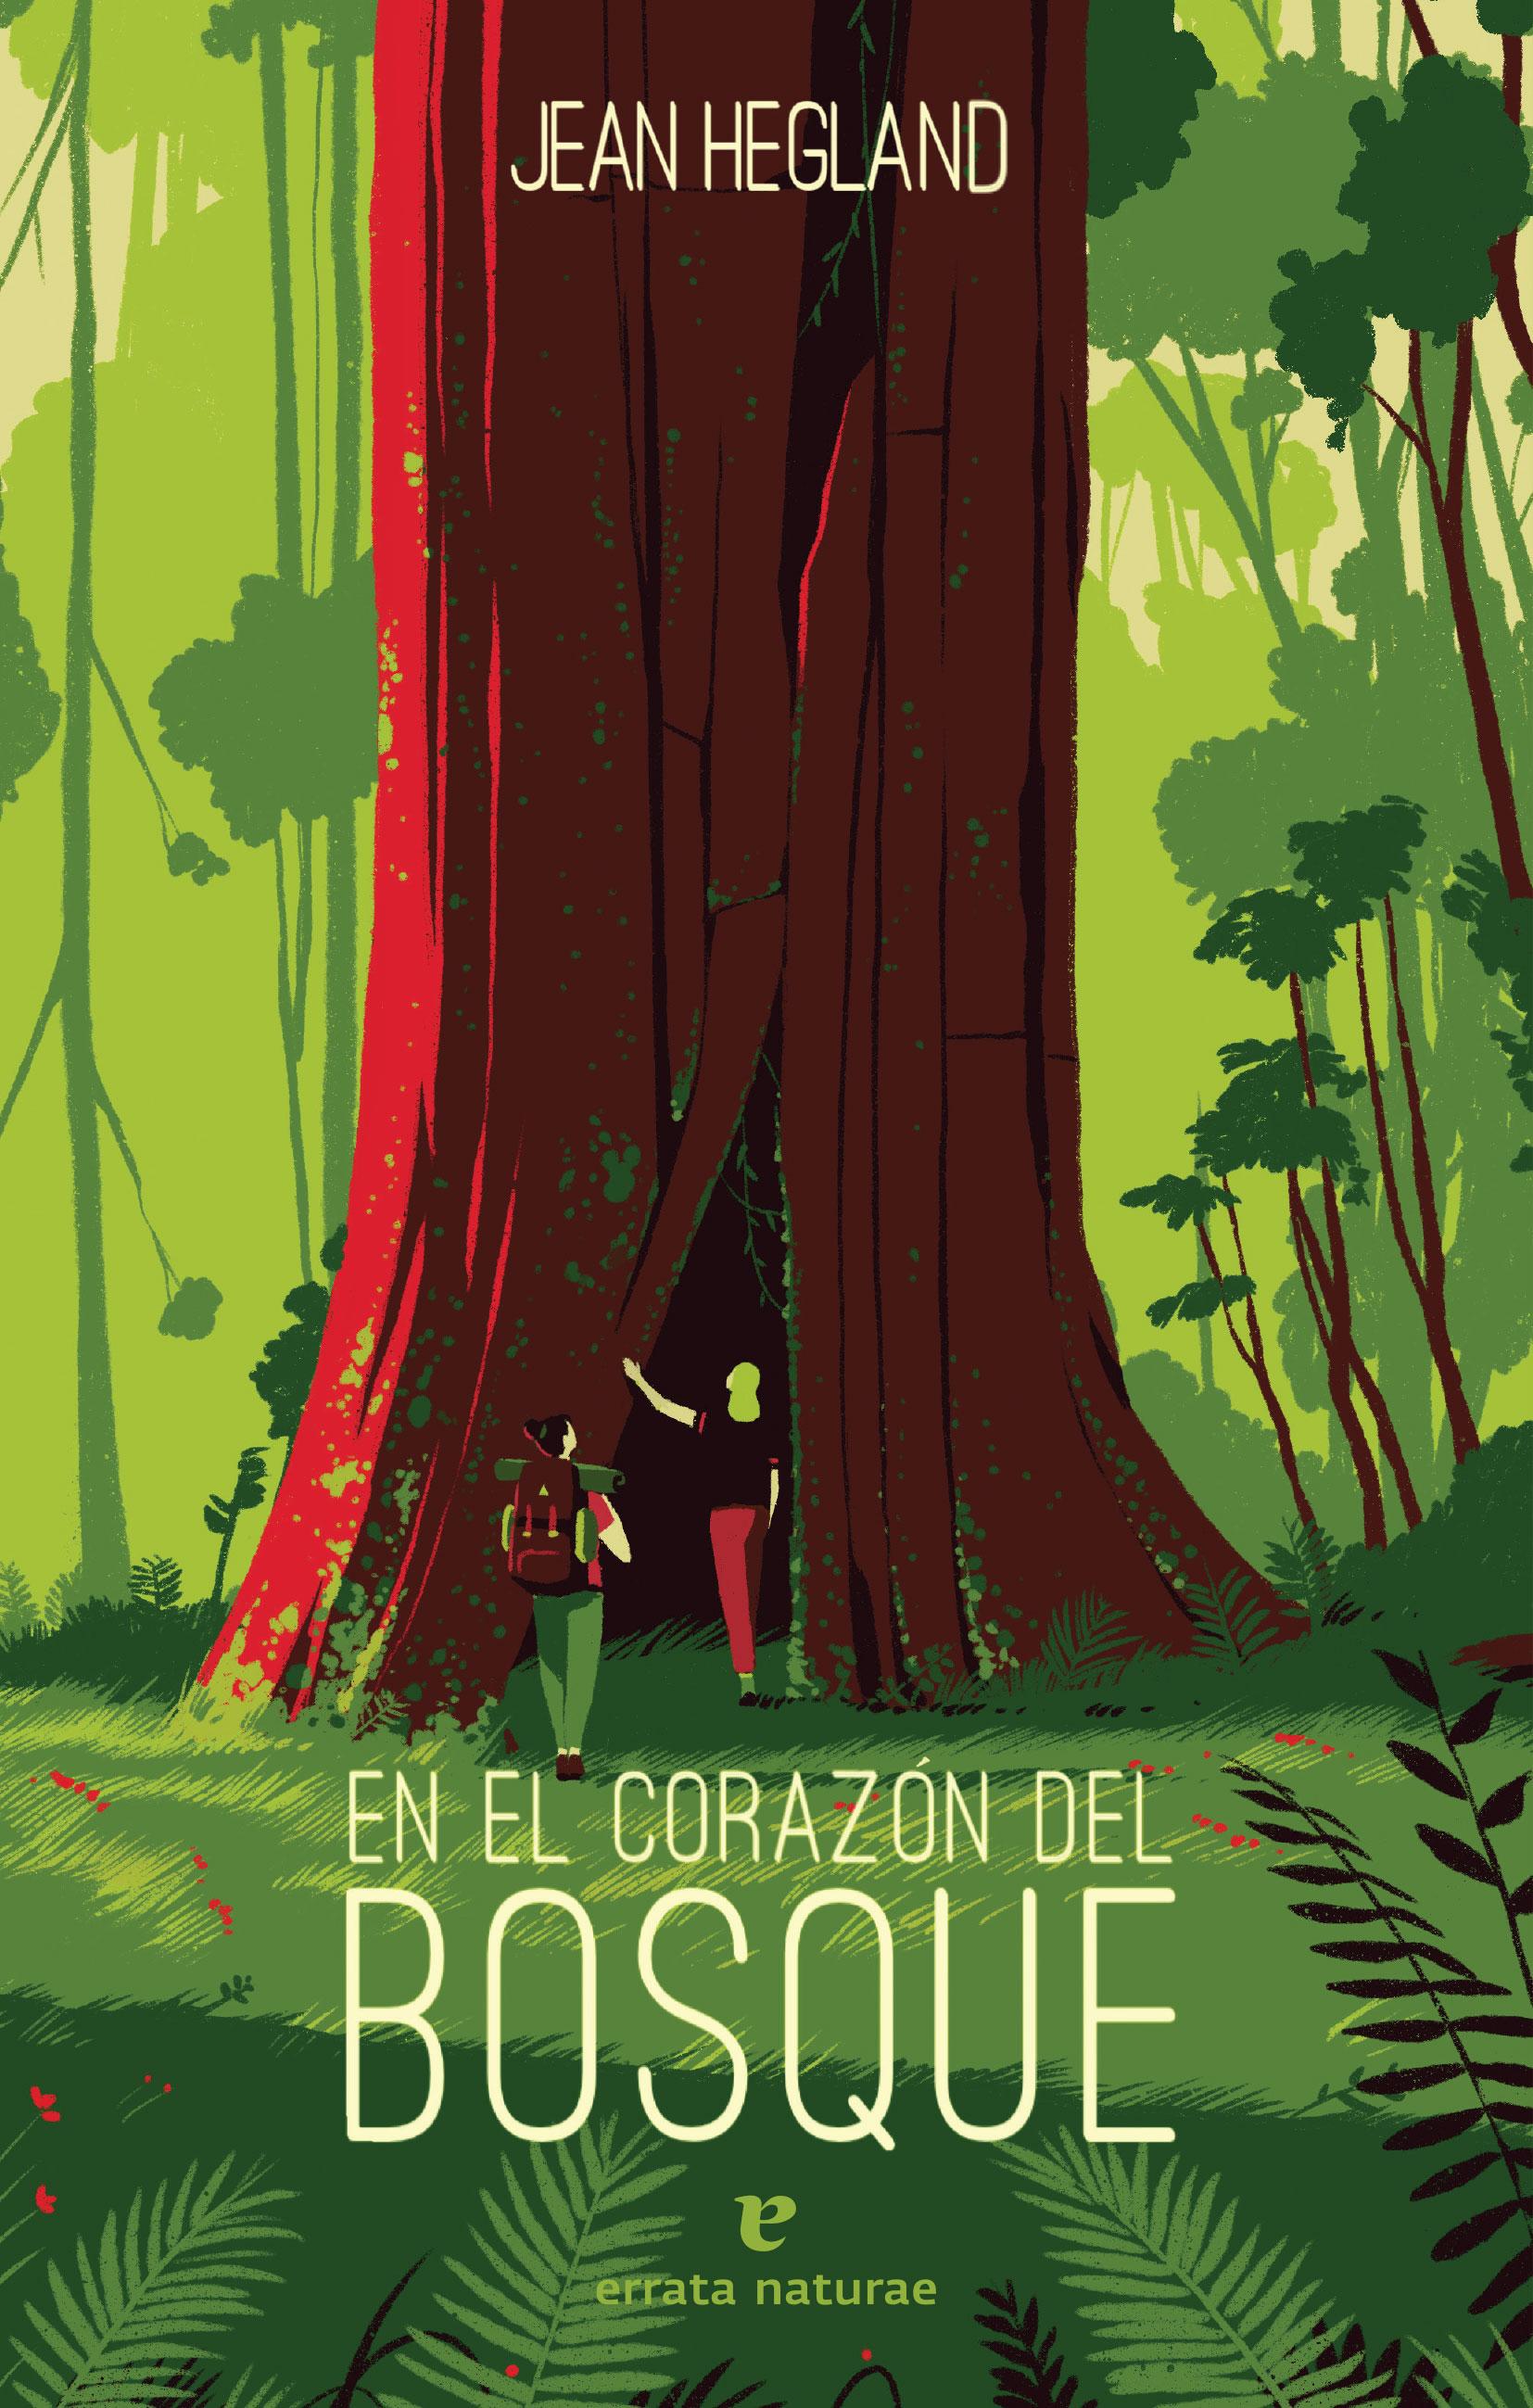 En el corazón del bosque | errata naturae